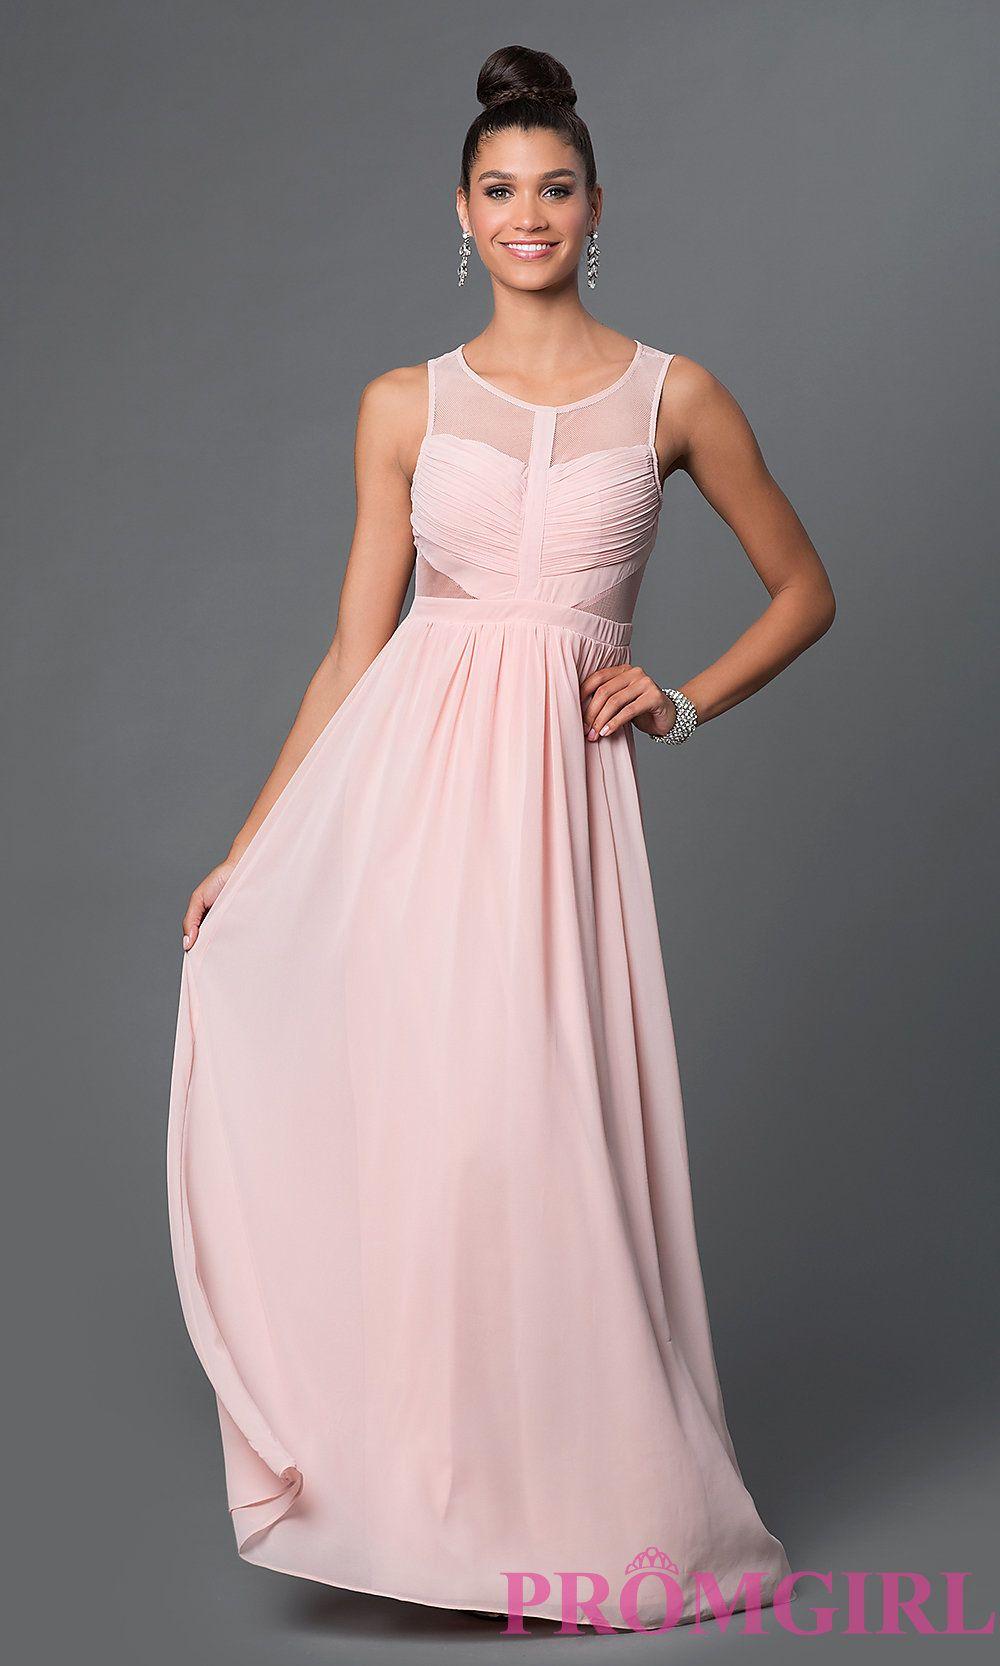 Image of long sleeveless side sheer cut out illusion back dress